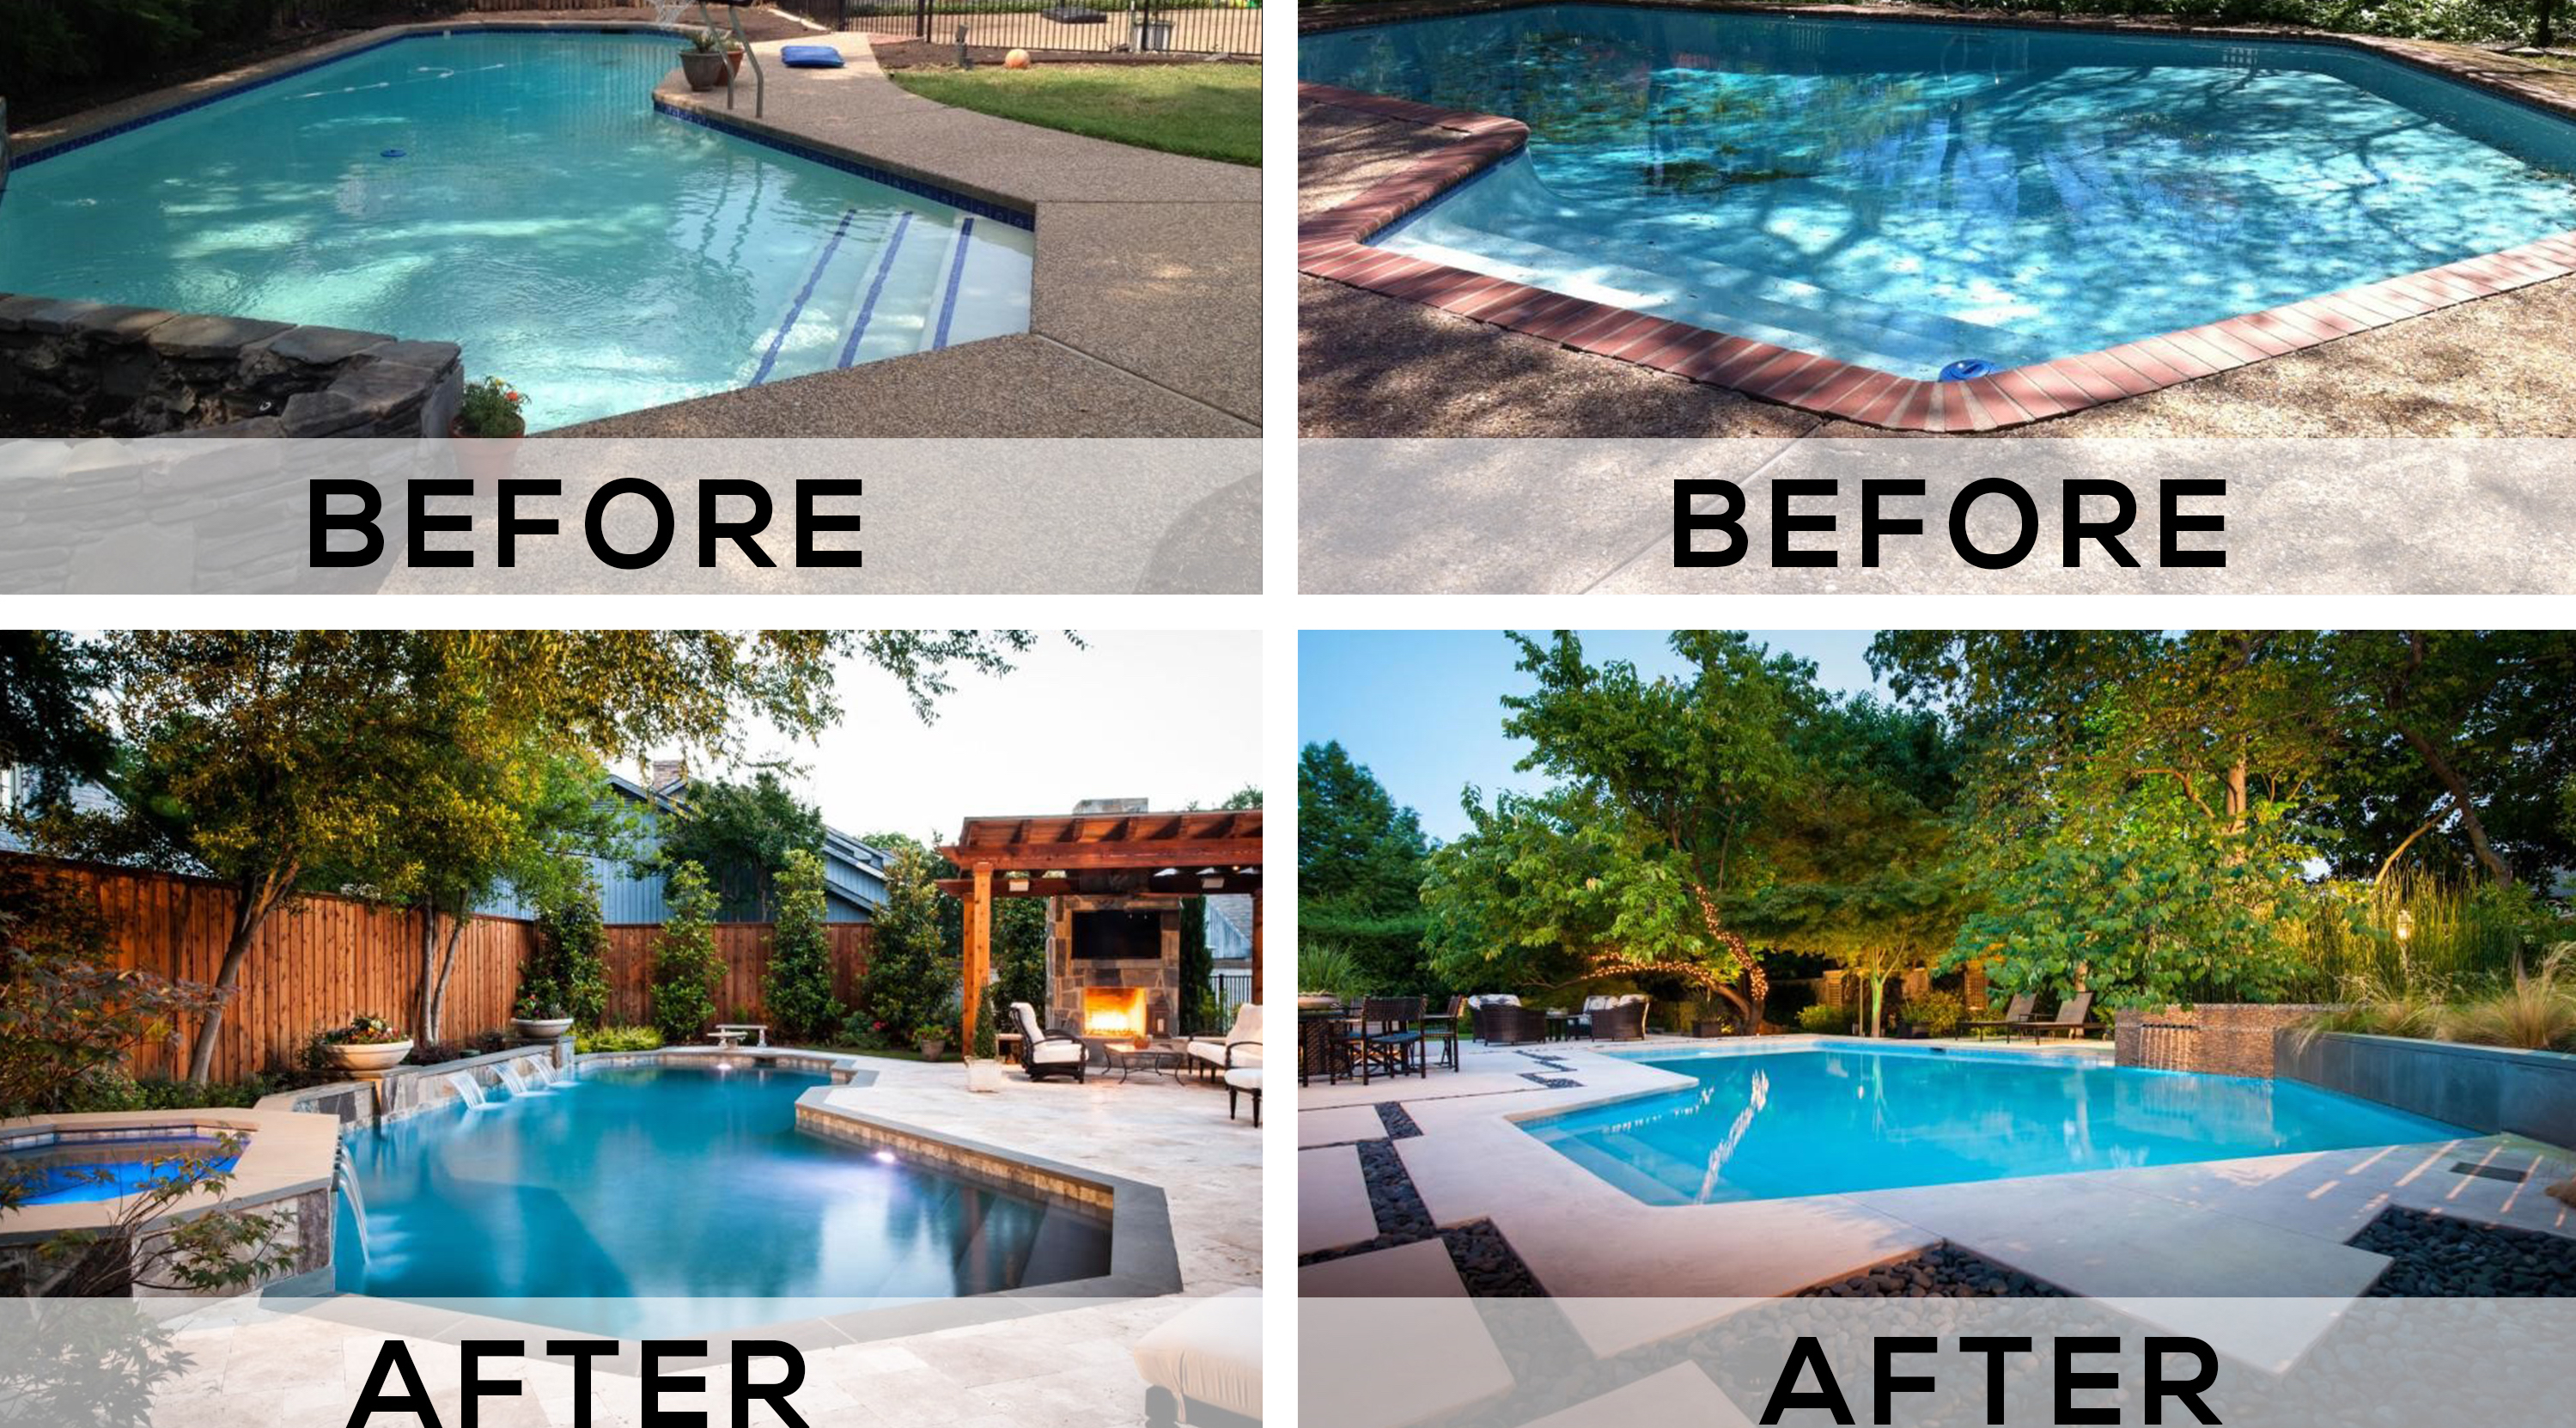 Backyard Pool Makeovers Before And After ~ BACKYARD POOL